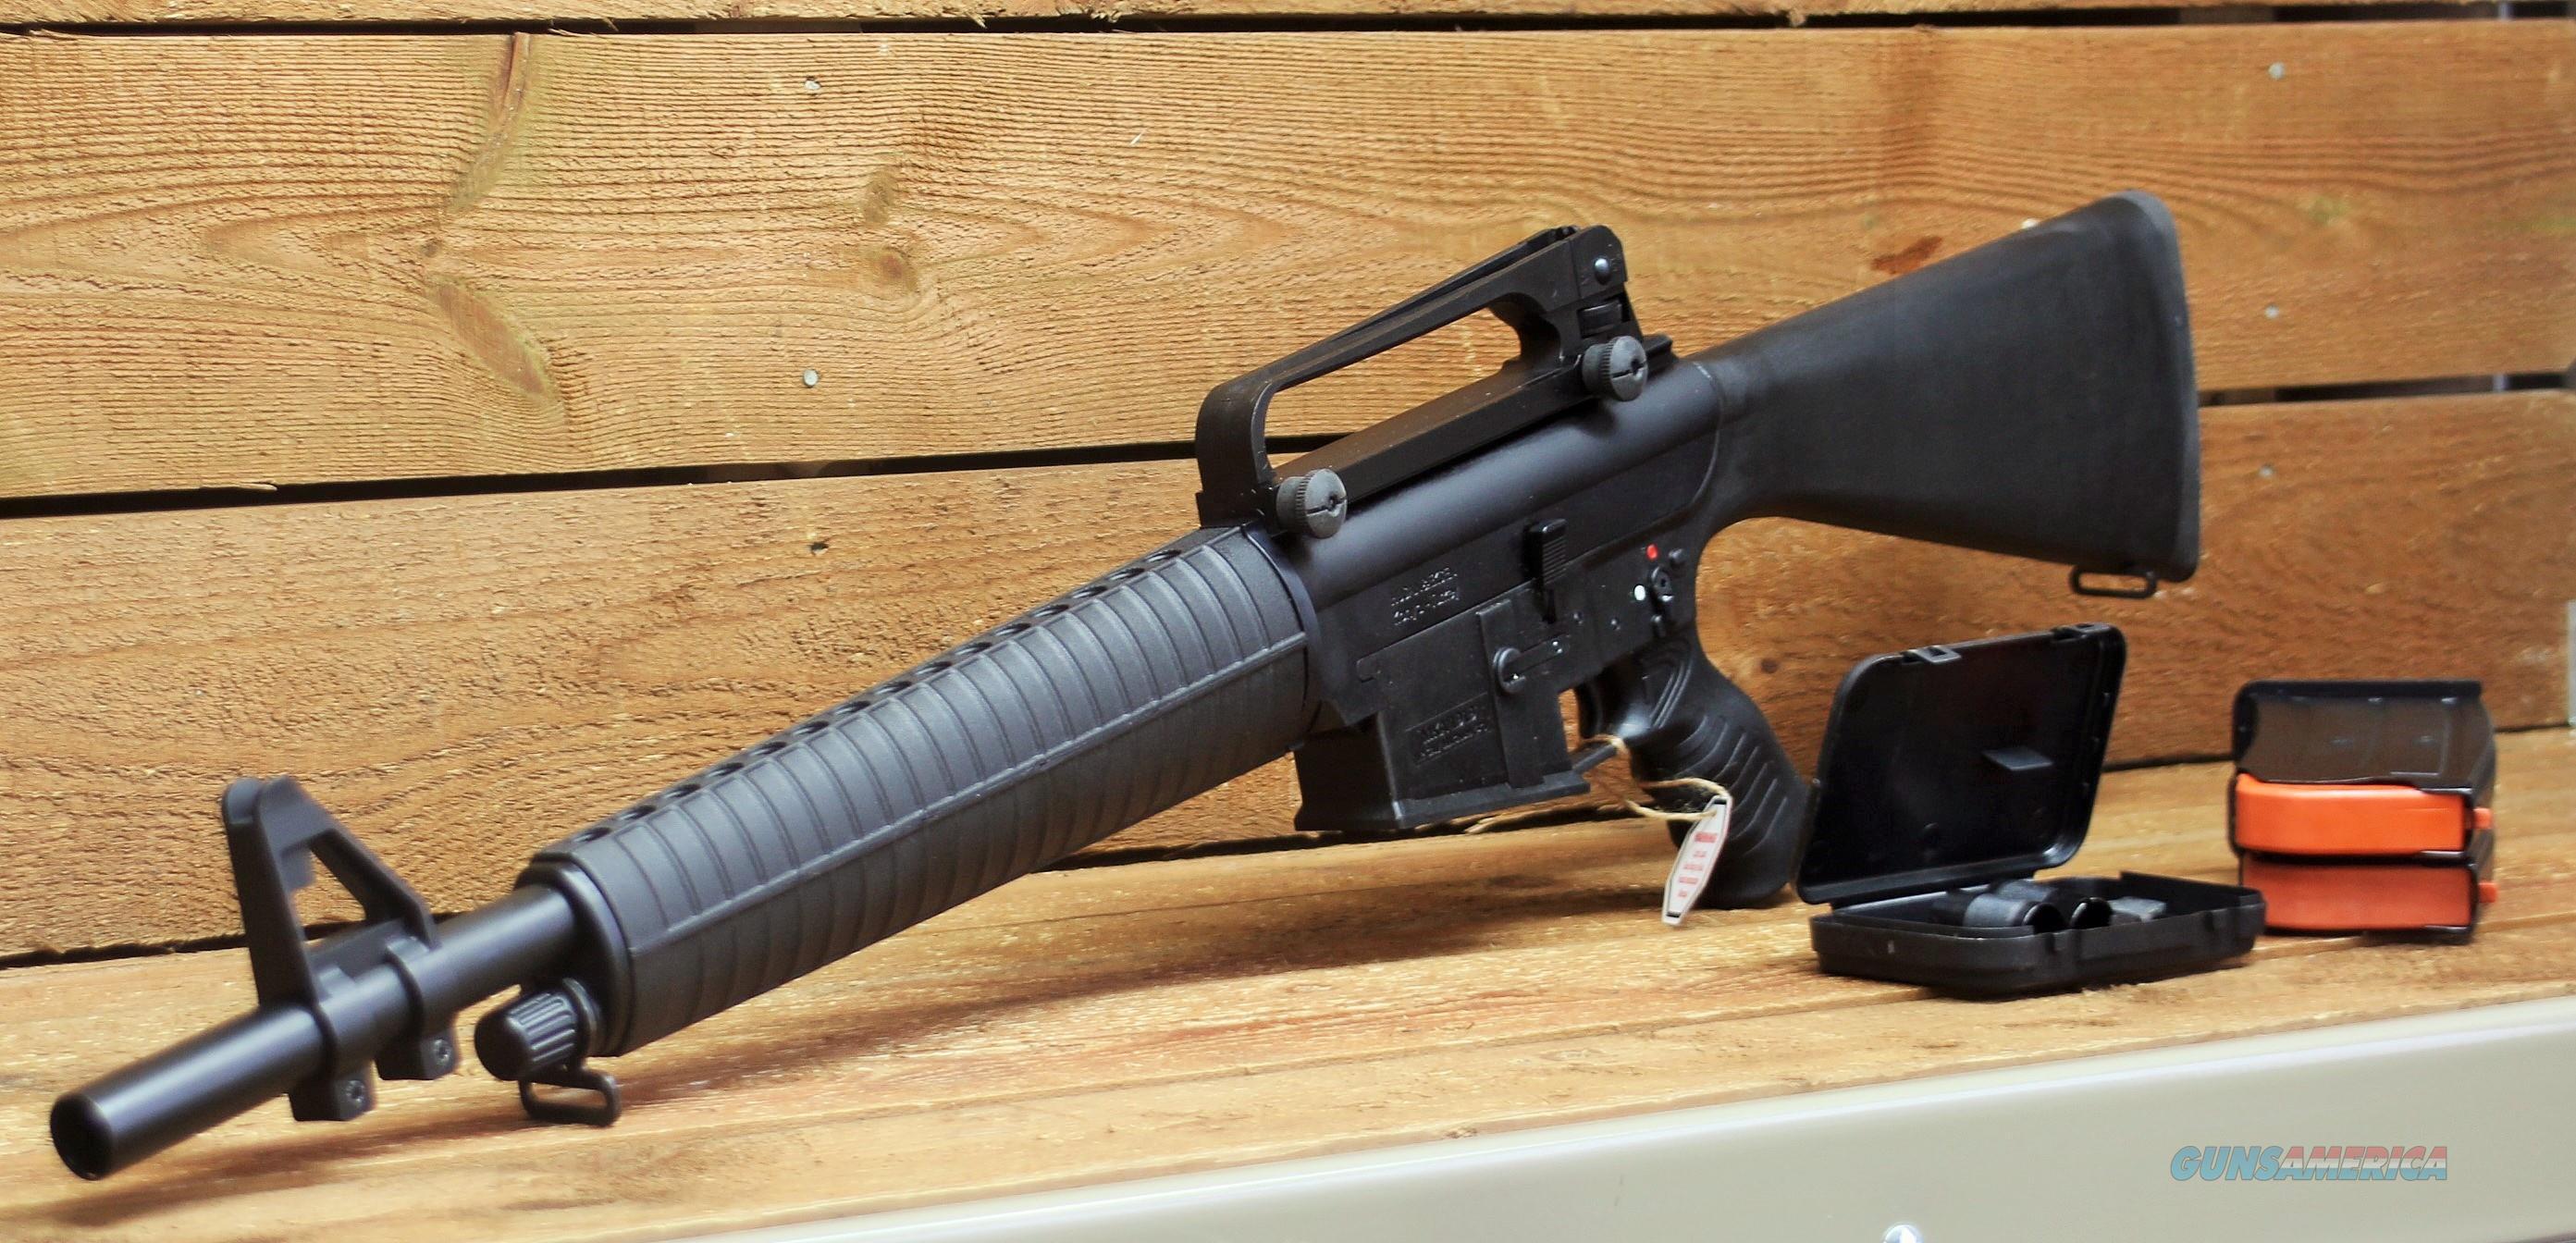 EASY PAY $49 DOWN LAYAWAY  European American Armory EAA USSG INC MKA 1919 Has Great AR-15 style sights Removable Box Magazine MKA1919 Match Shotgun Picatinny  700000-USG  Guns > Shotguns > A Misc Shotguns